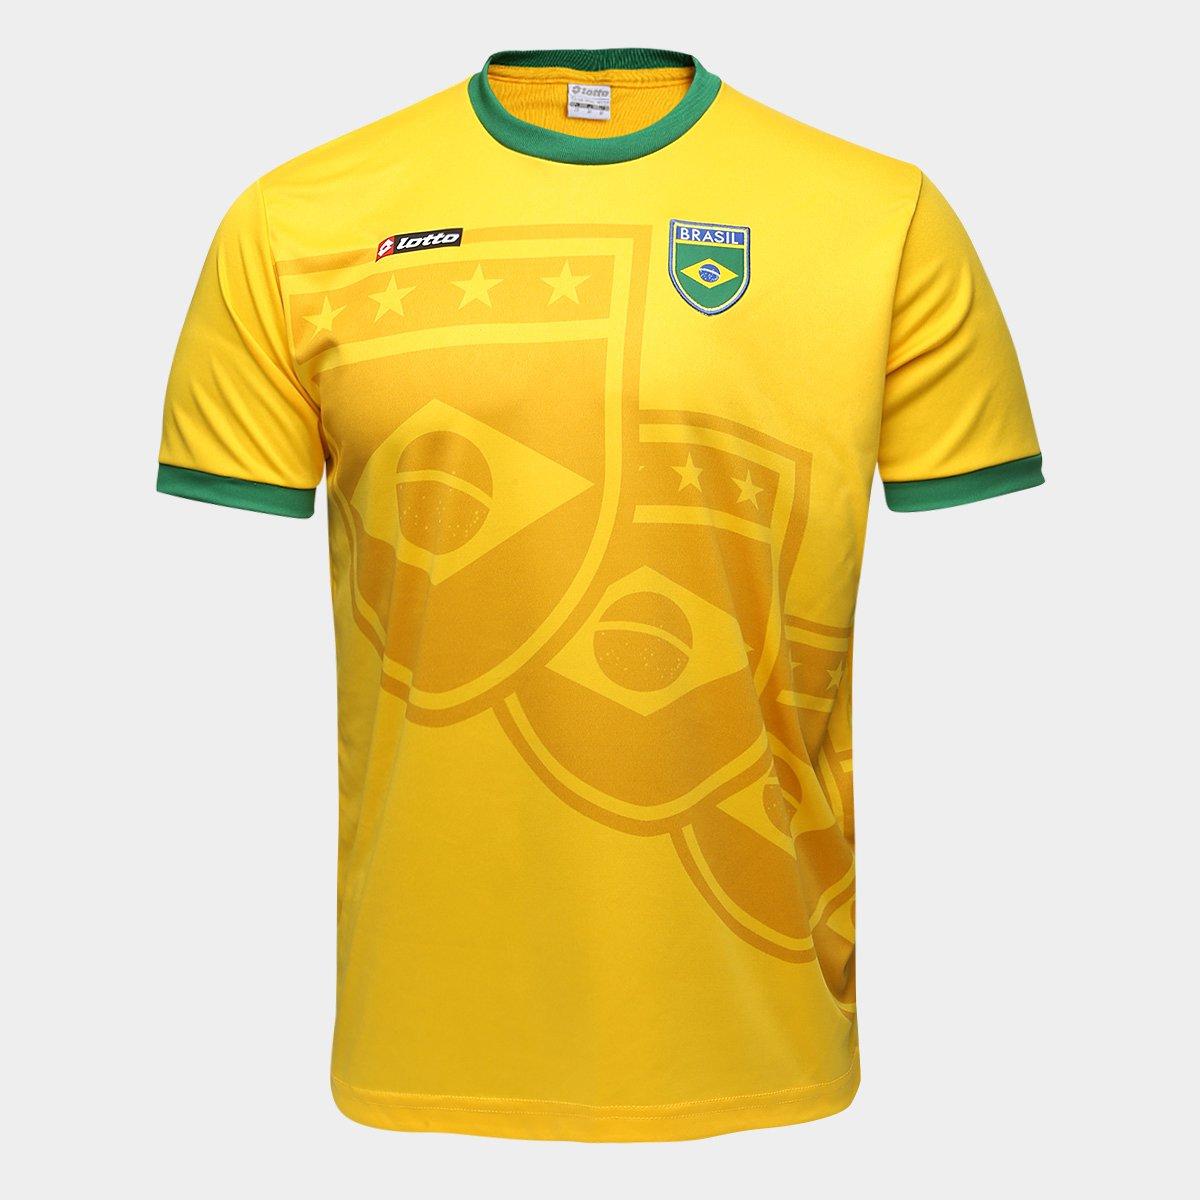 f2541b250f904 Camisa Brasil 1994 n° 11 Lotto Masculina